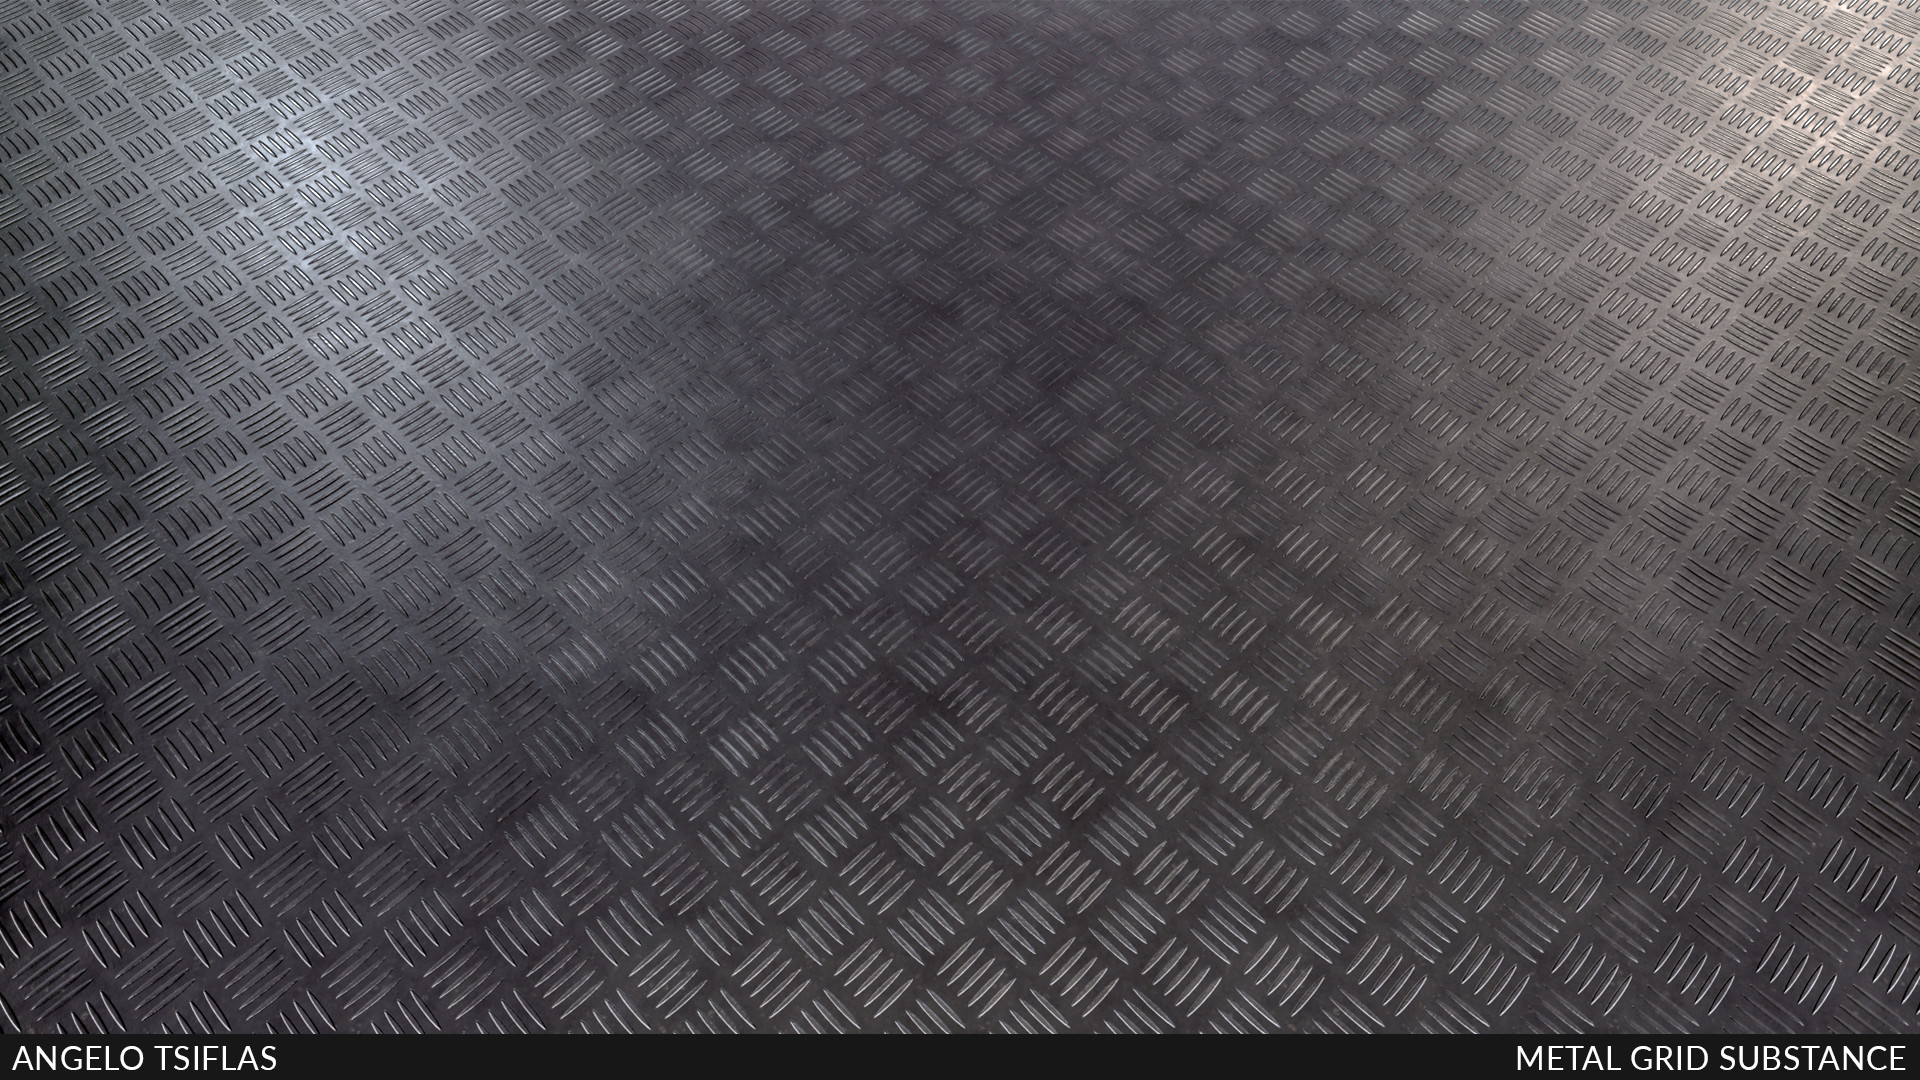 Angelo tsiflas metalgrid full background